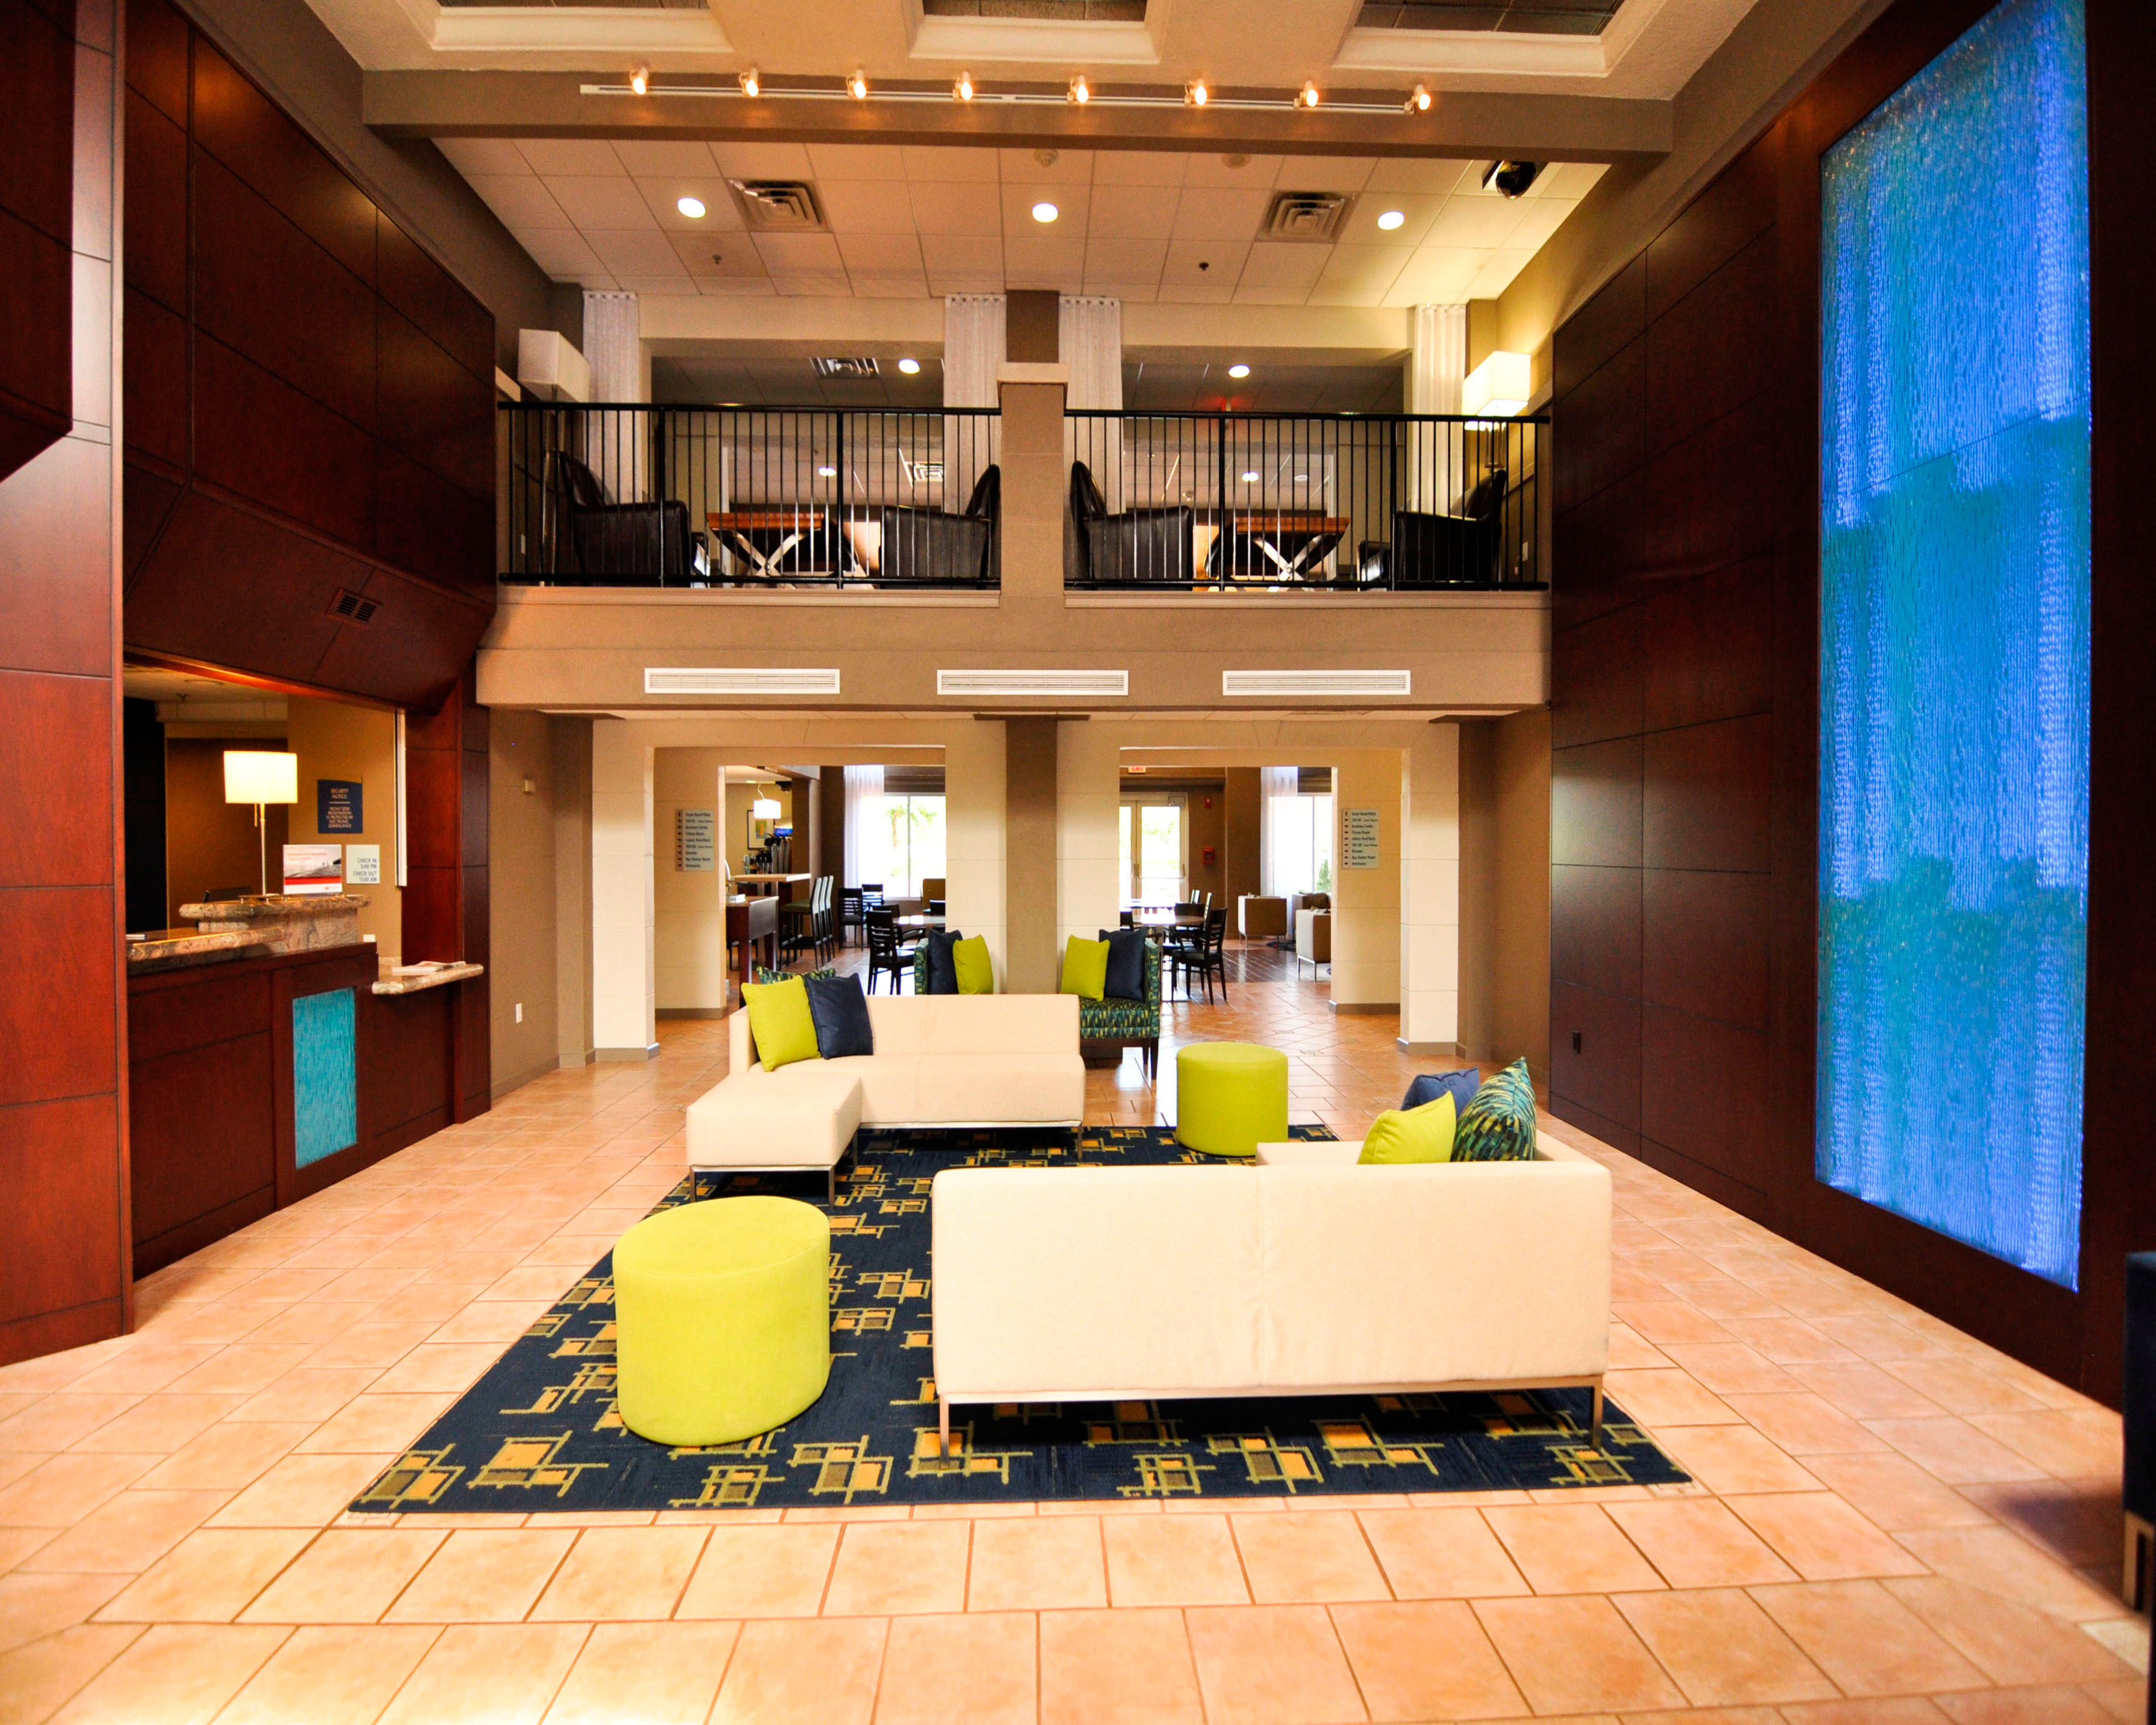 Holiday Inn Express & Suites Port Clinton-Catawba Island image 4